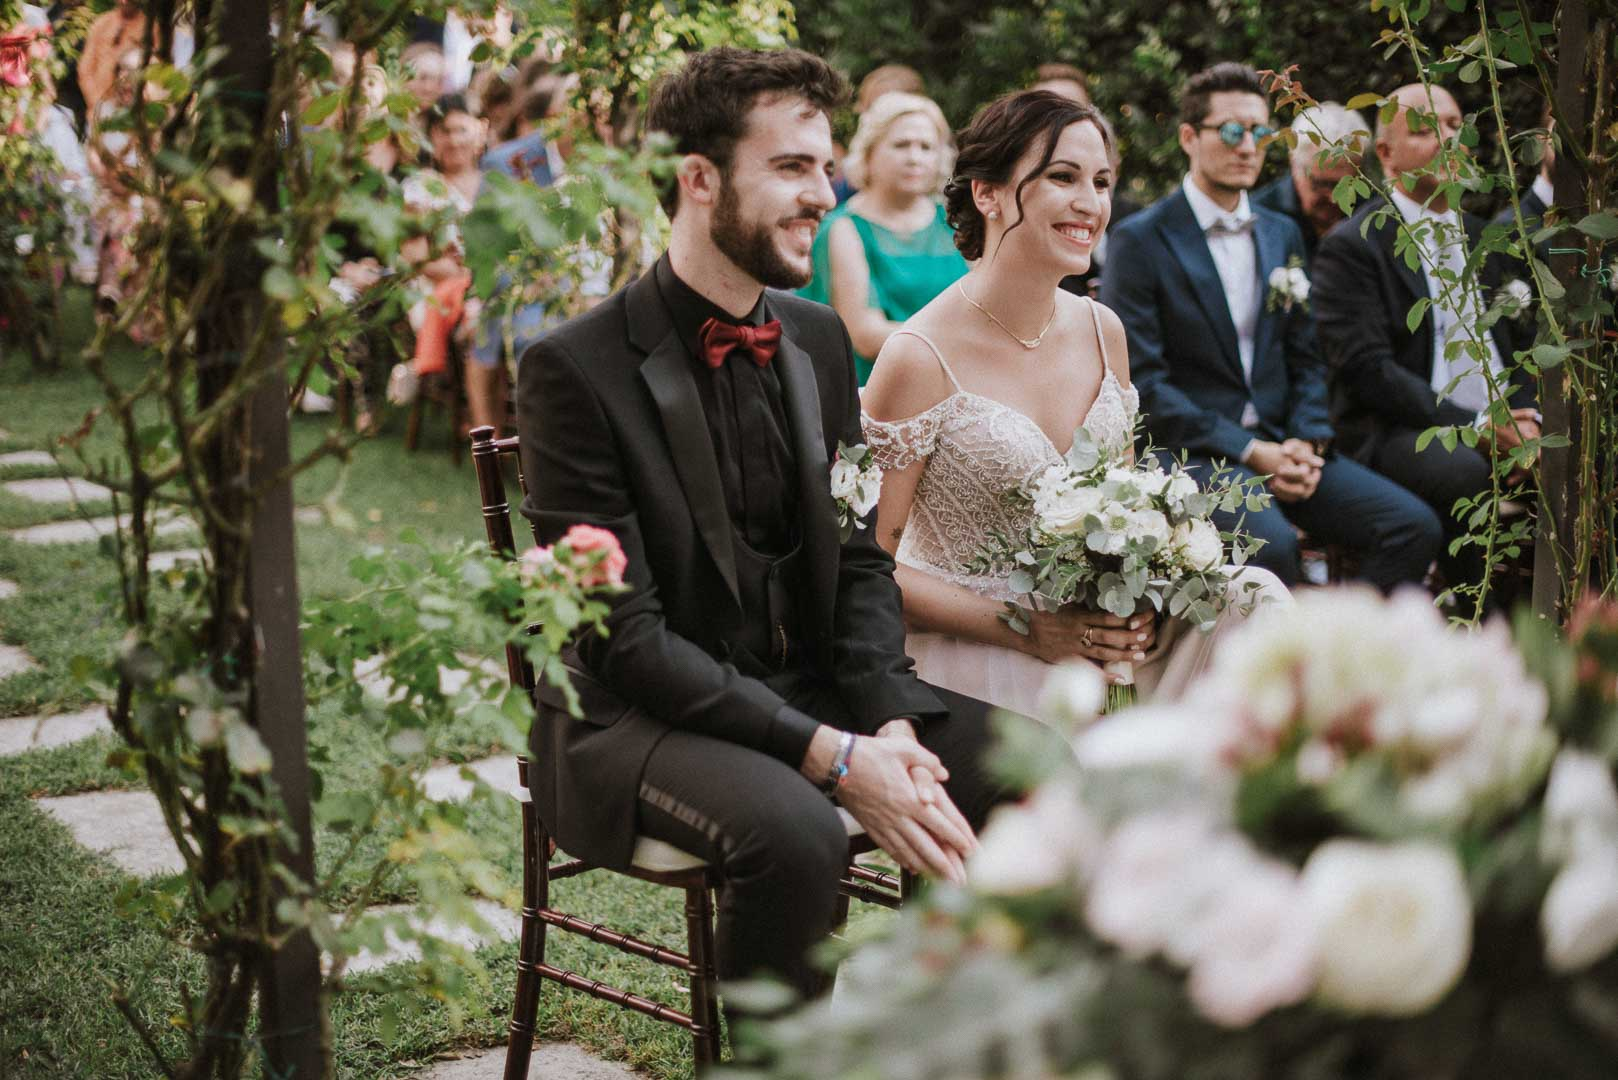 wedding-photographer-destination-fineart-bespoke-reportage-tuscany-villascorzi-vivianeizzo-spazio46-77